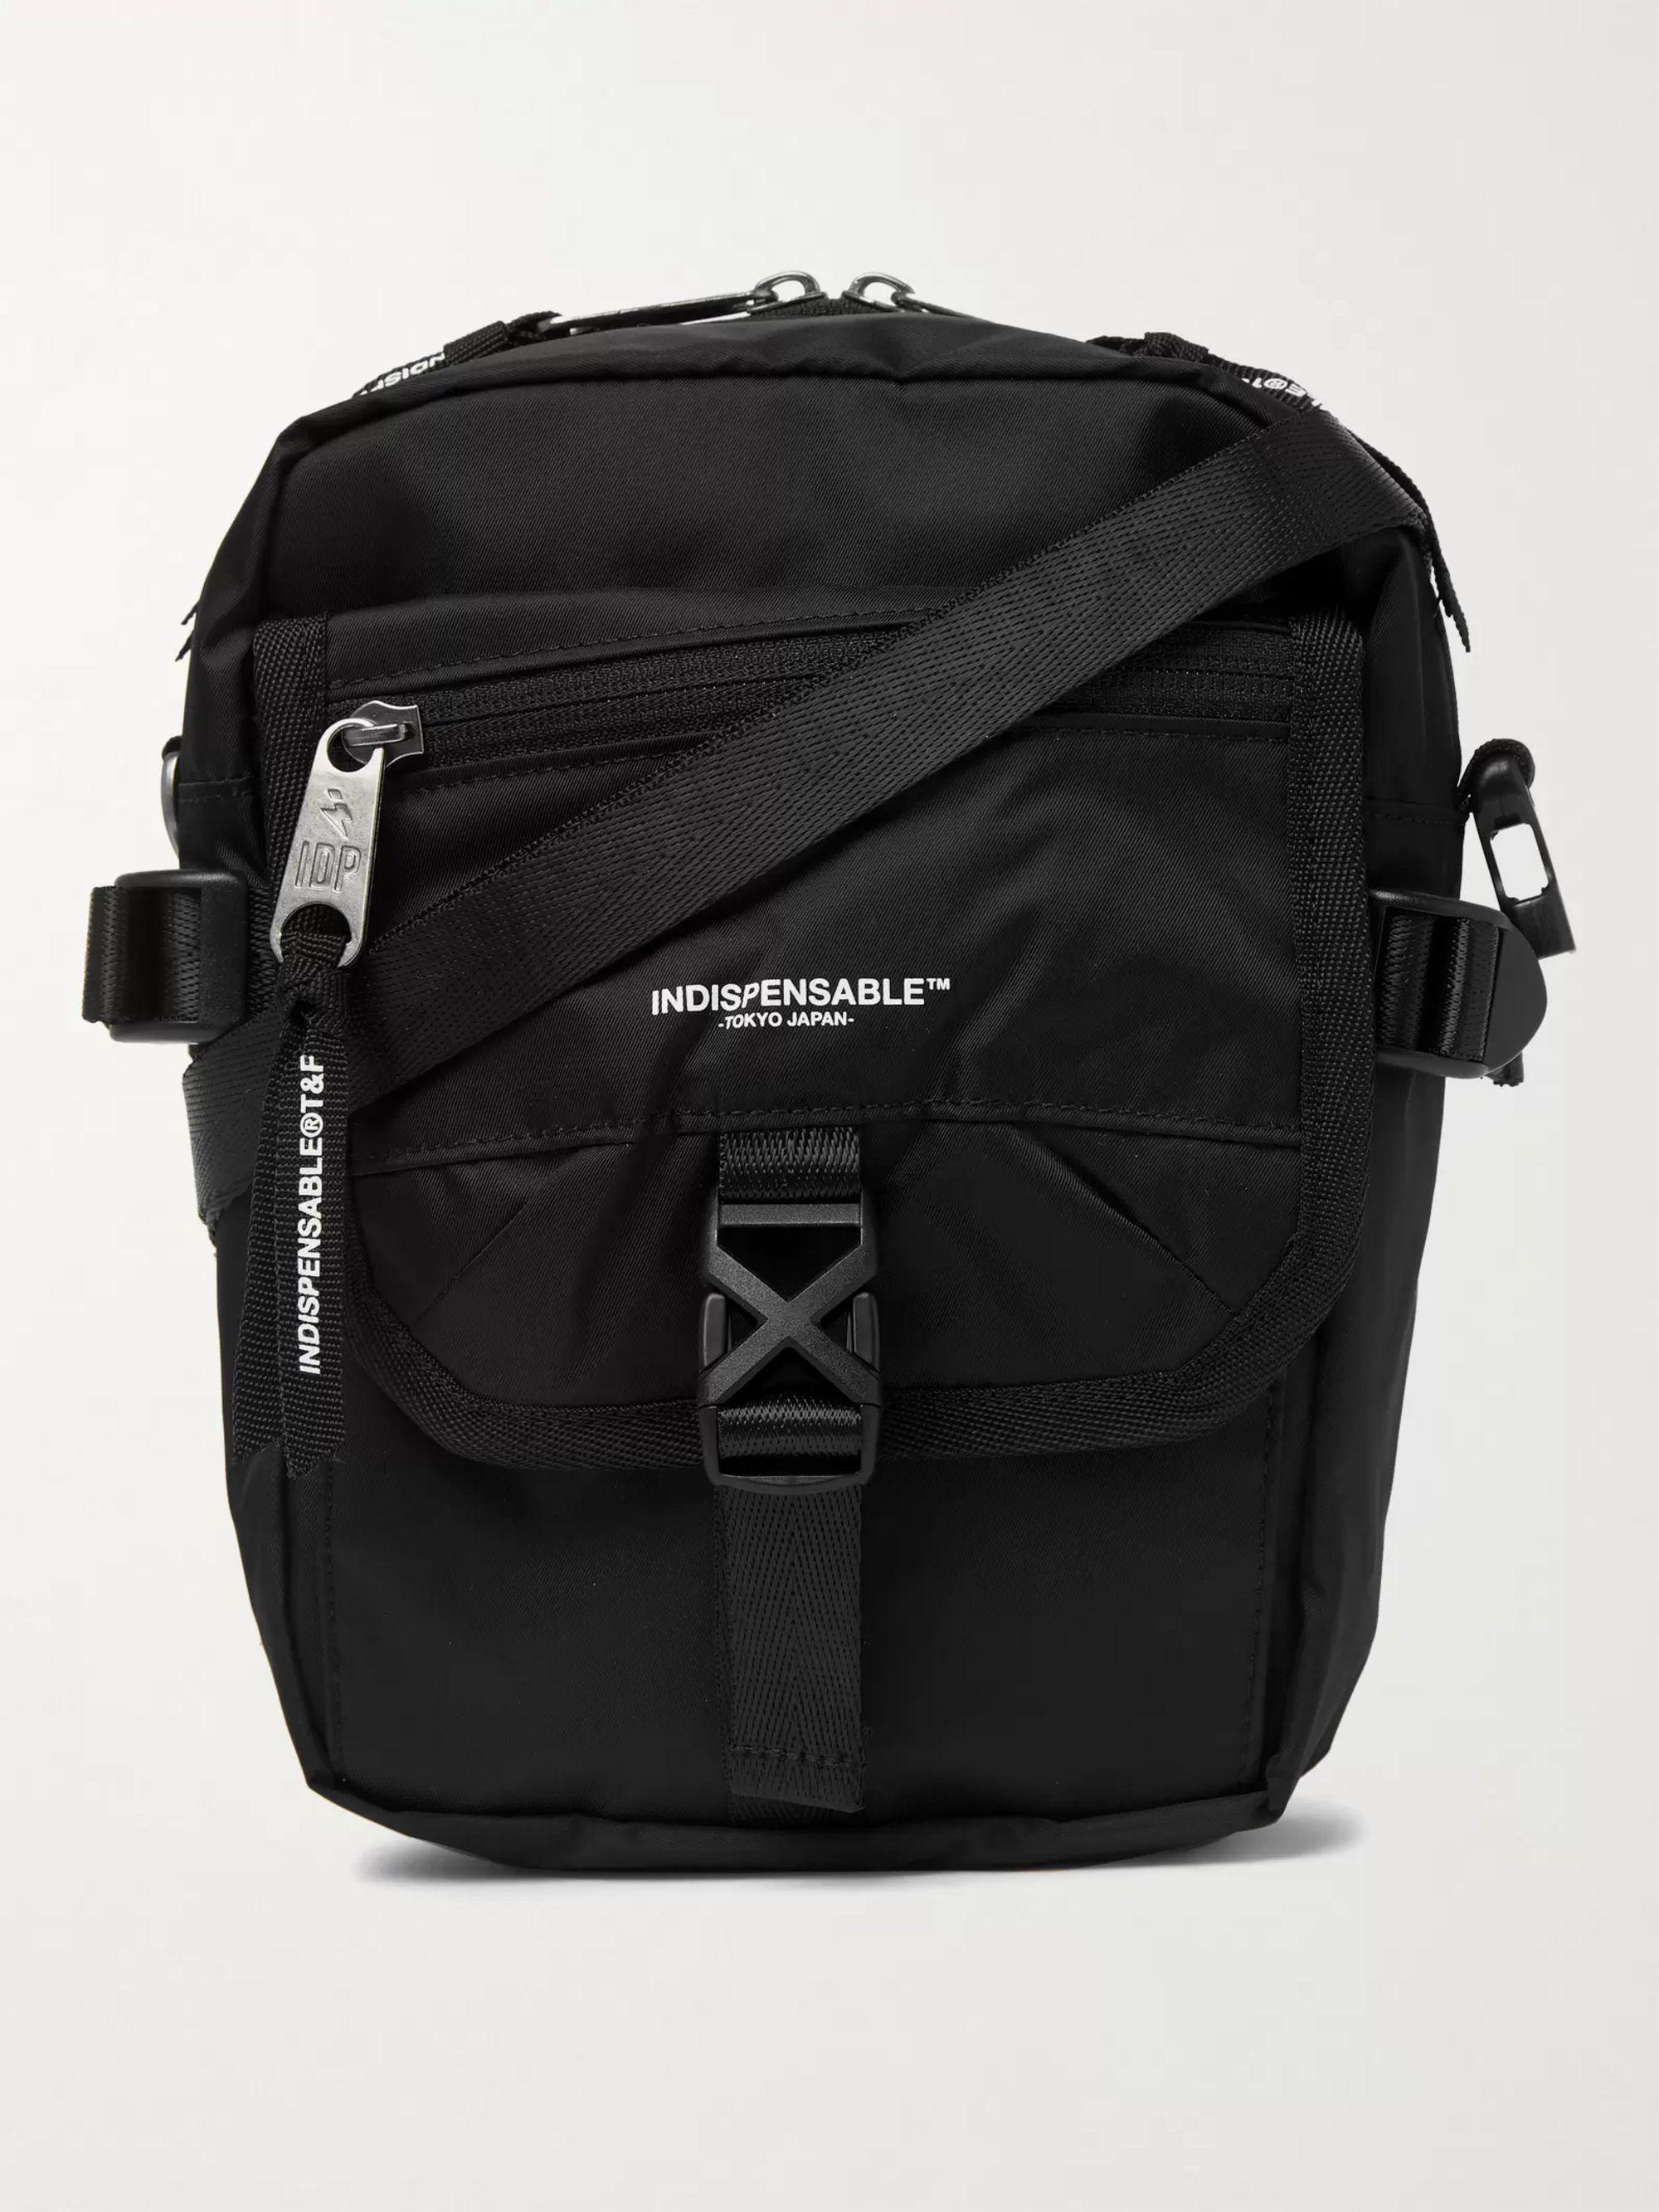 Indispensable Buddy ECONYL Messenger Bag,Black